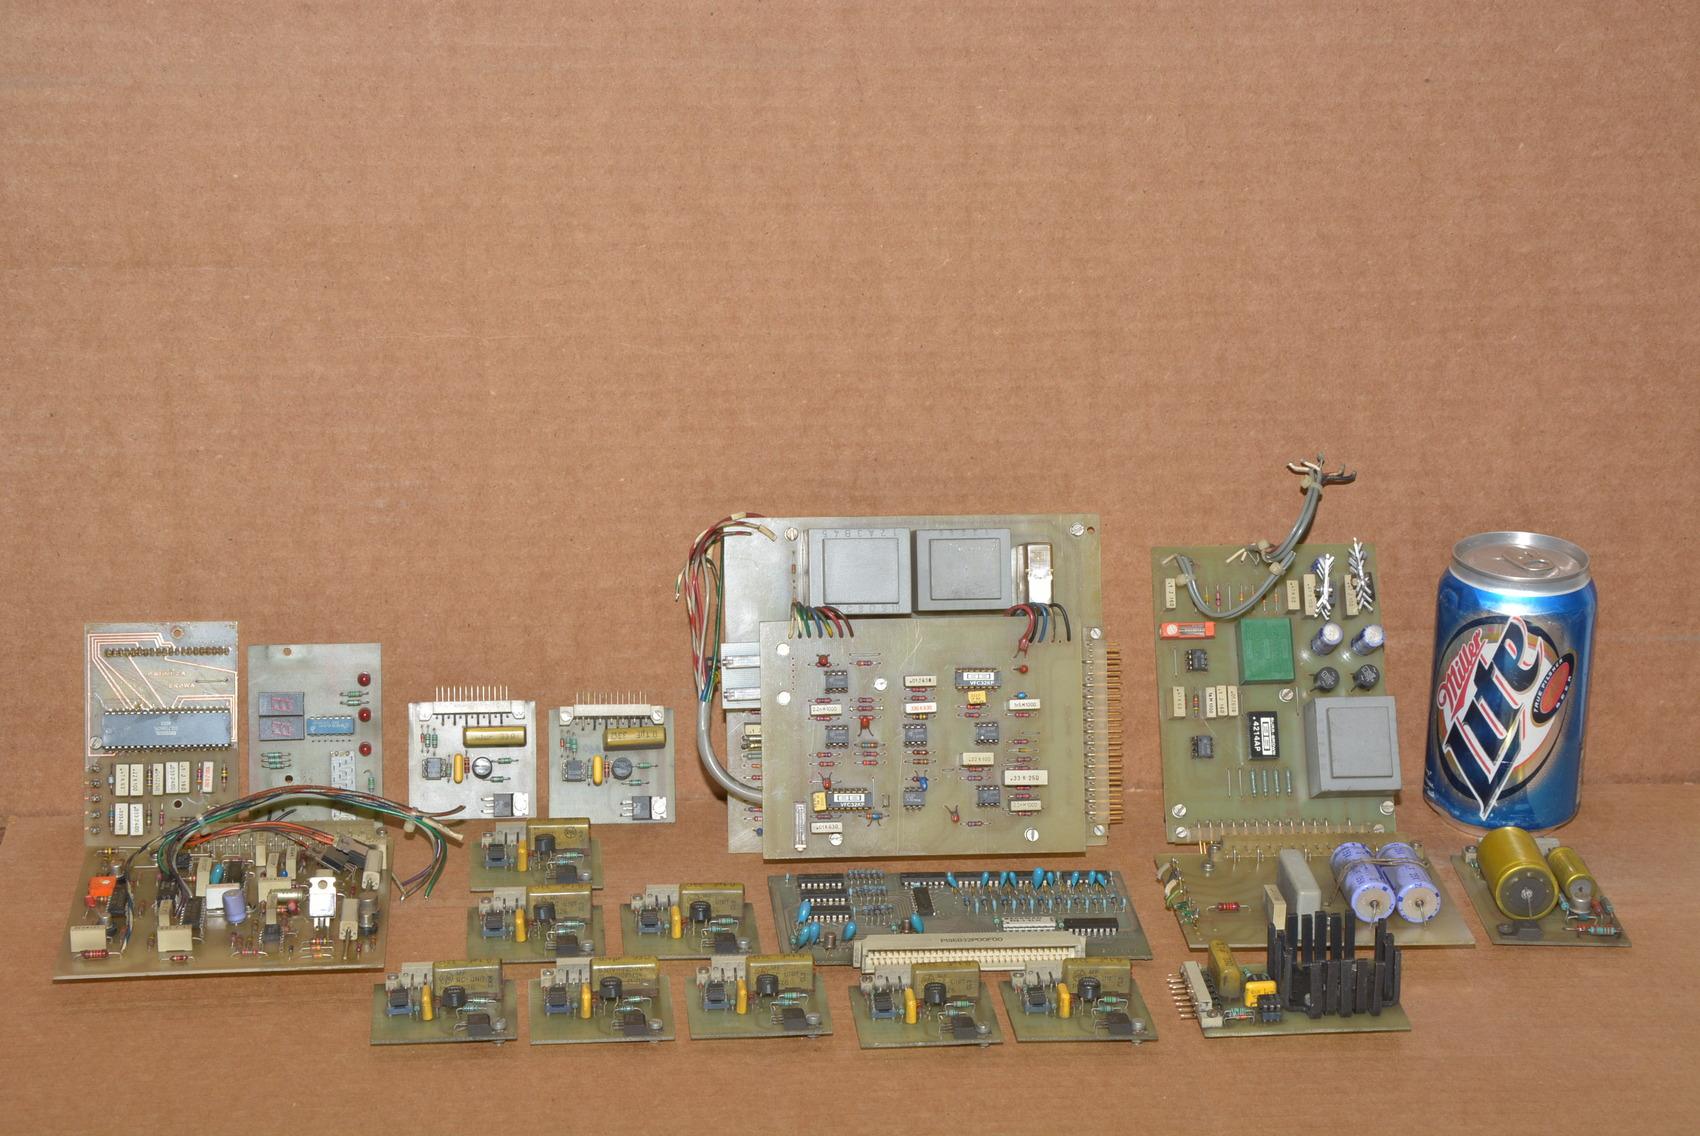 19charmilles Erowa E 200 Eg50 Edm Control Pcb Boards Inv13887 Ebay Printed Wiring Image Is Loading 19 Charmilles